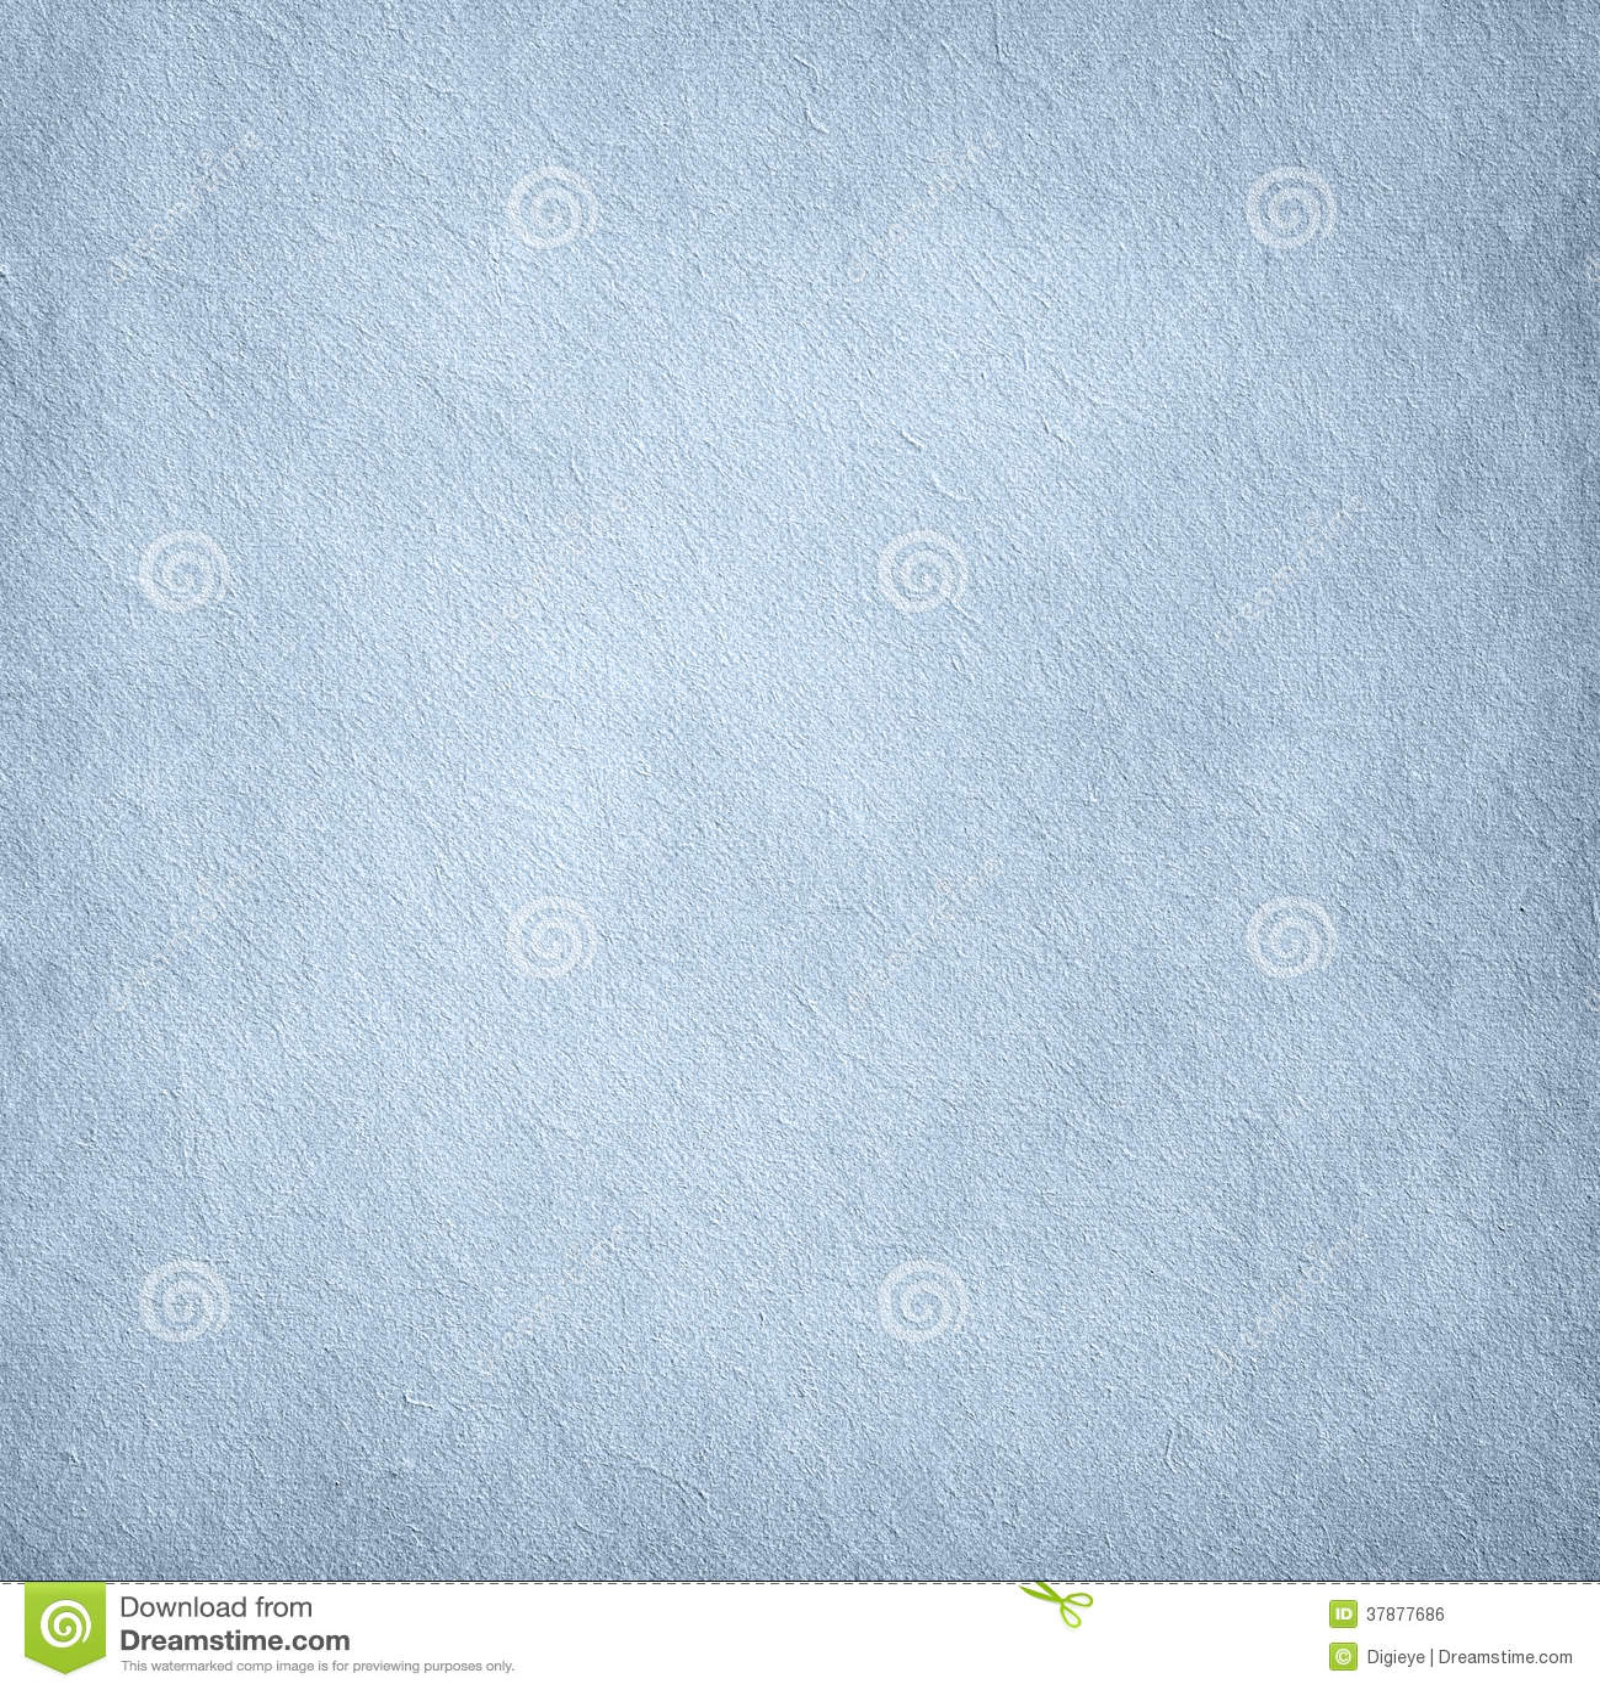 Plantilla del fondo - pared de papel o enyesada arrugada